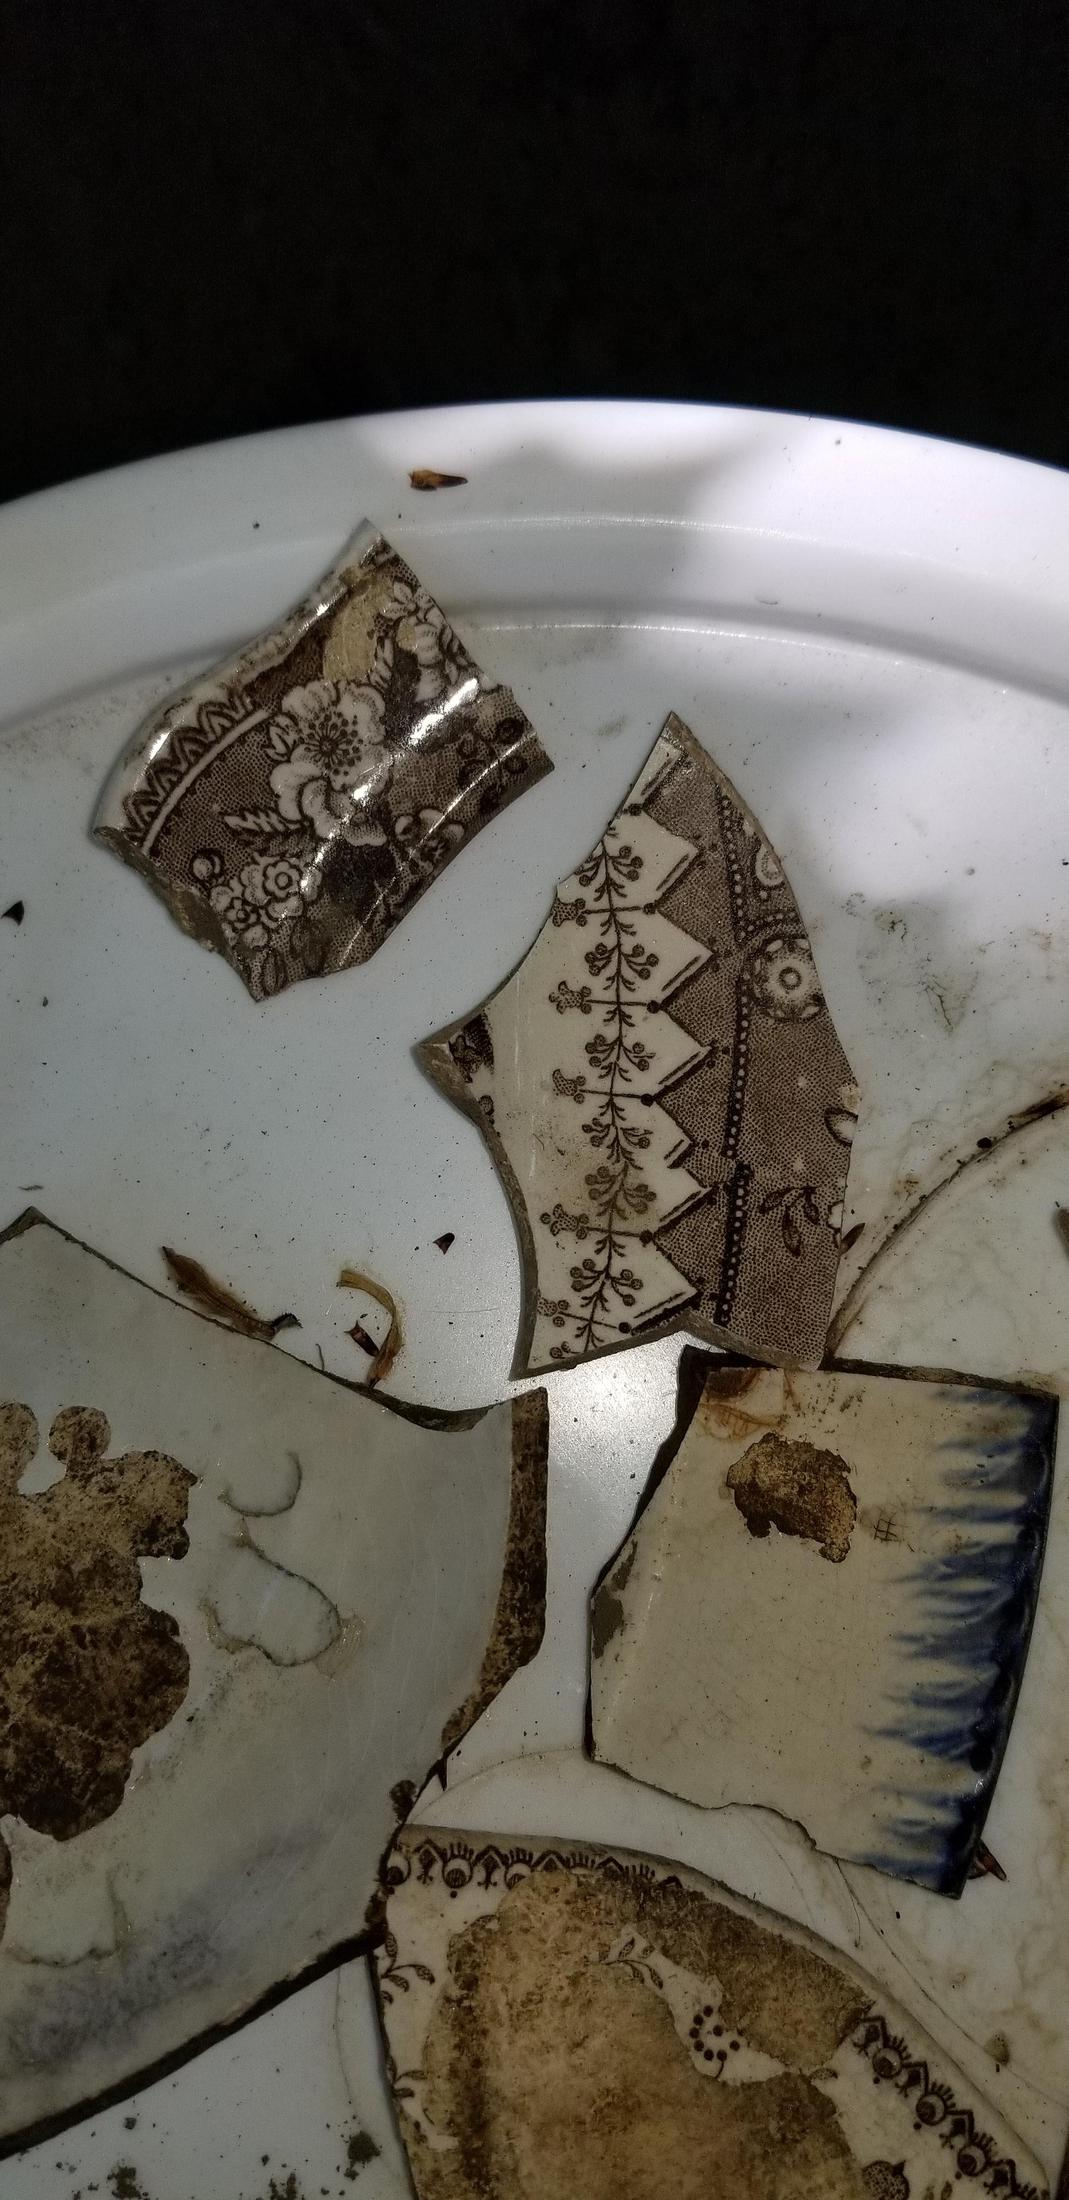 Photo: More excavated china